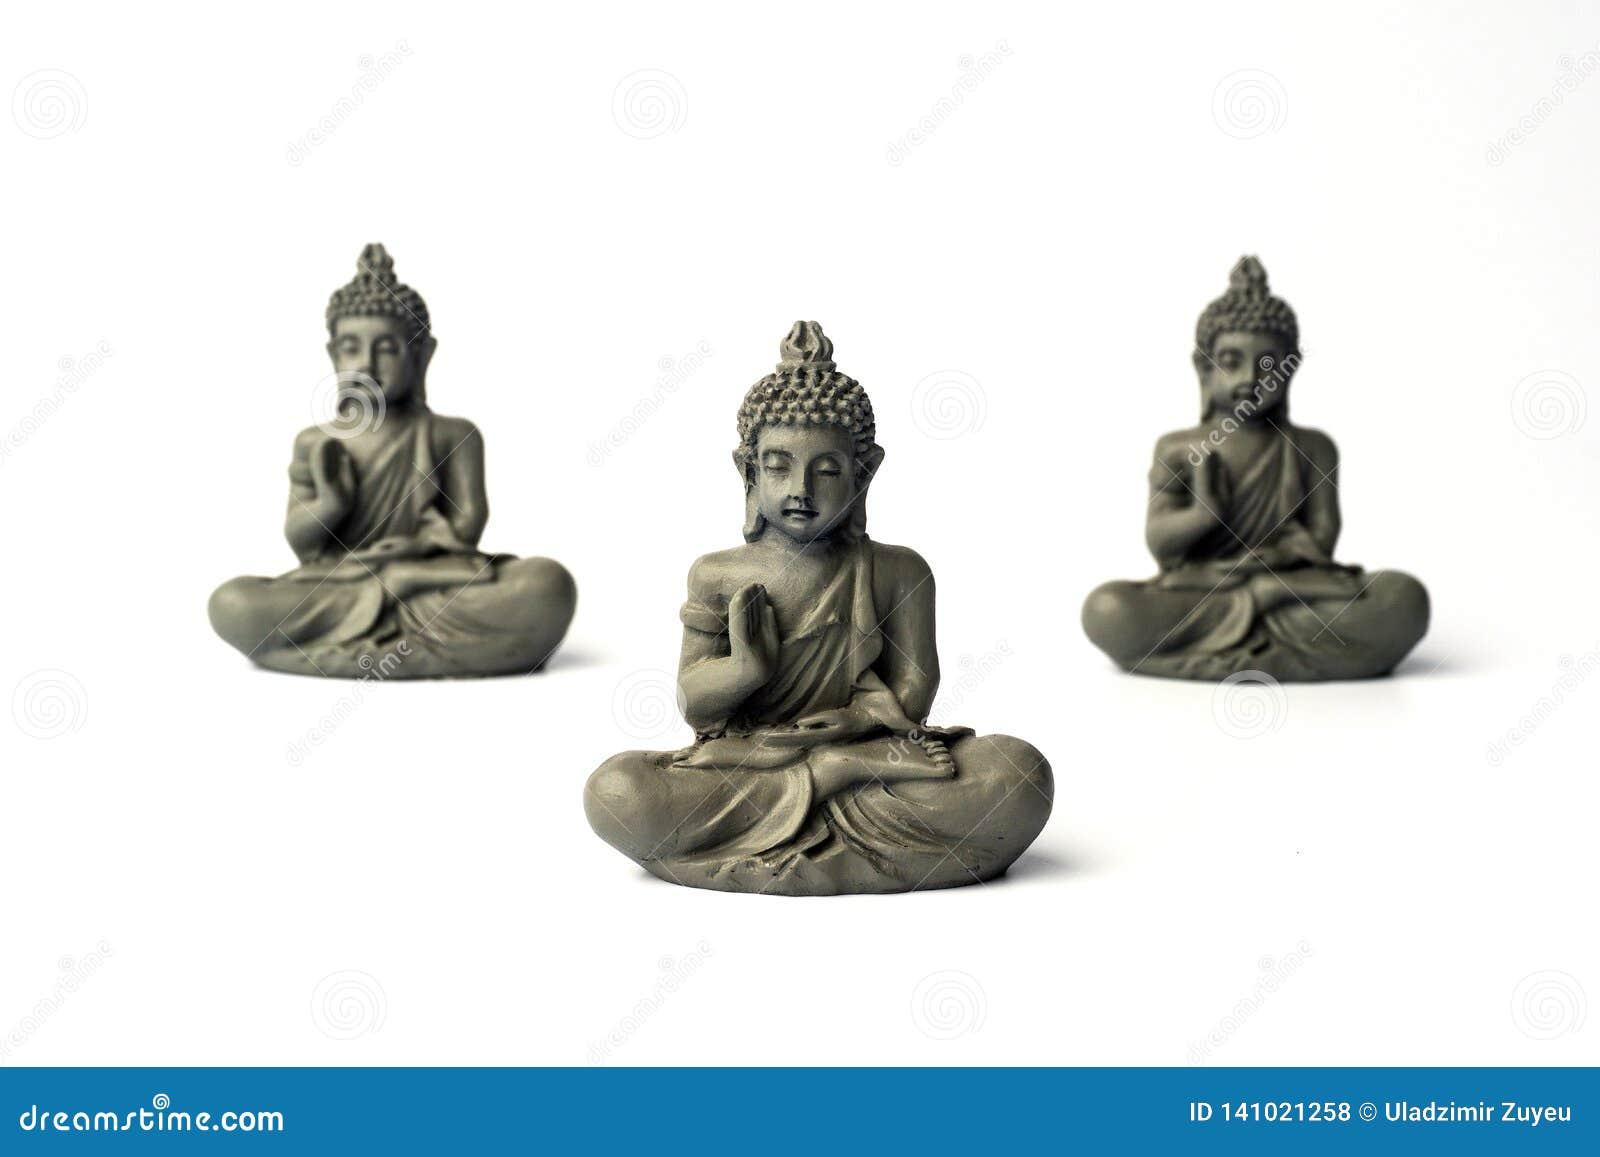 Ð头脑的¡ oncentration 瑜伽概念 莲花姿势 禅宗凝思背景 放松最小的概念